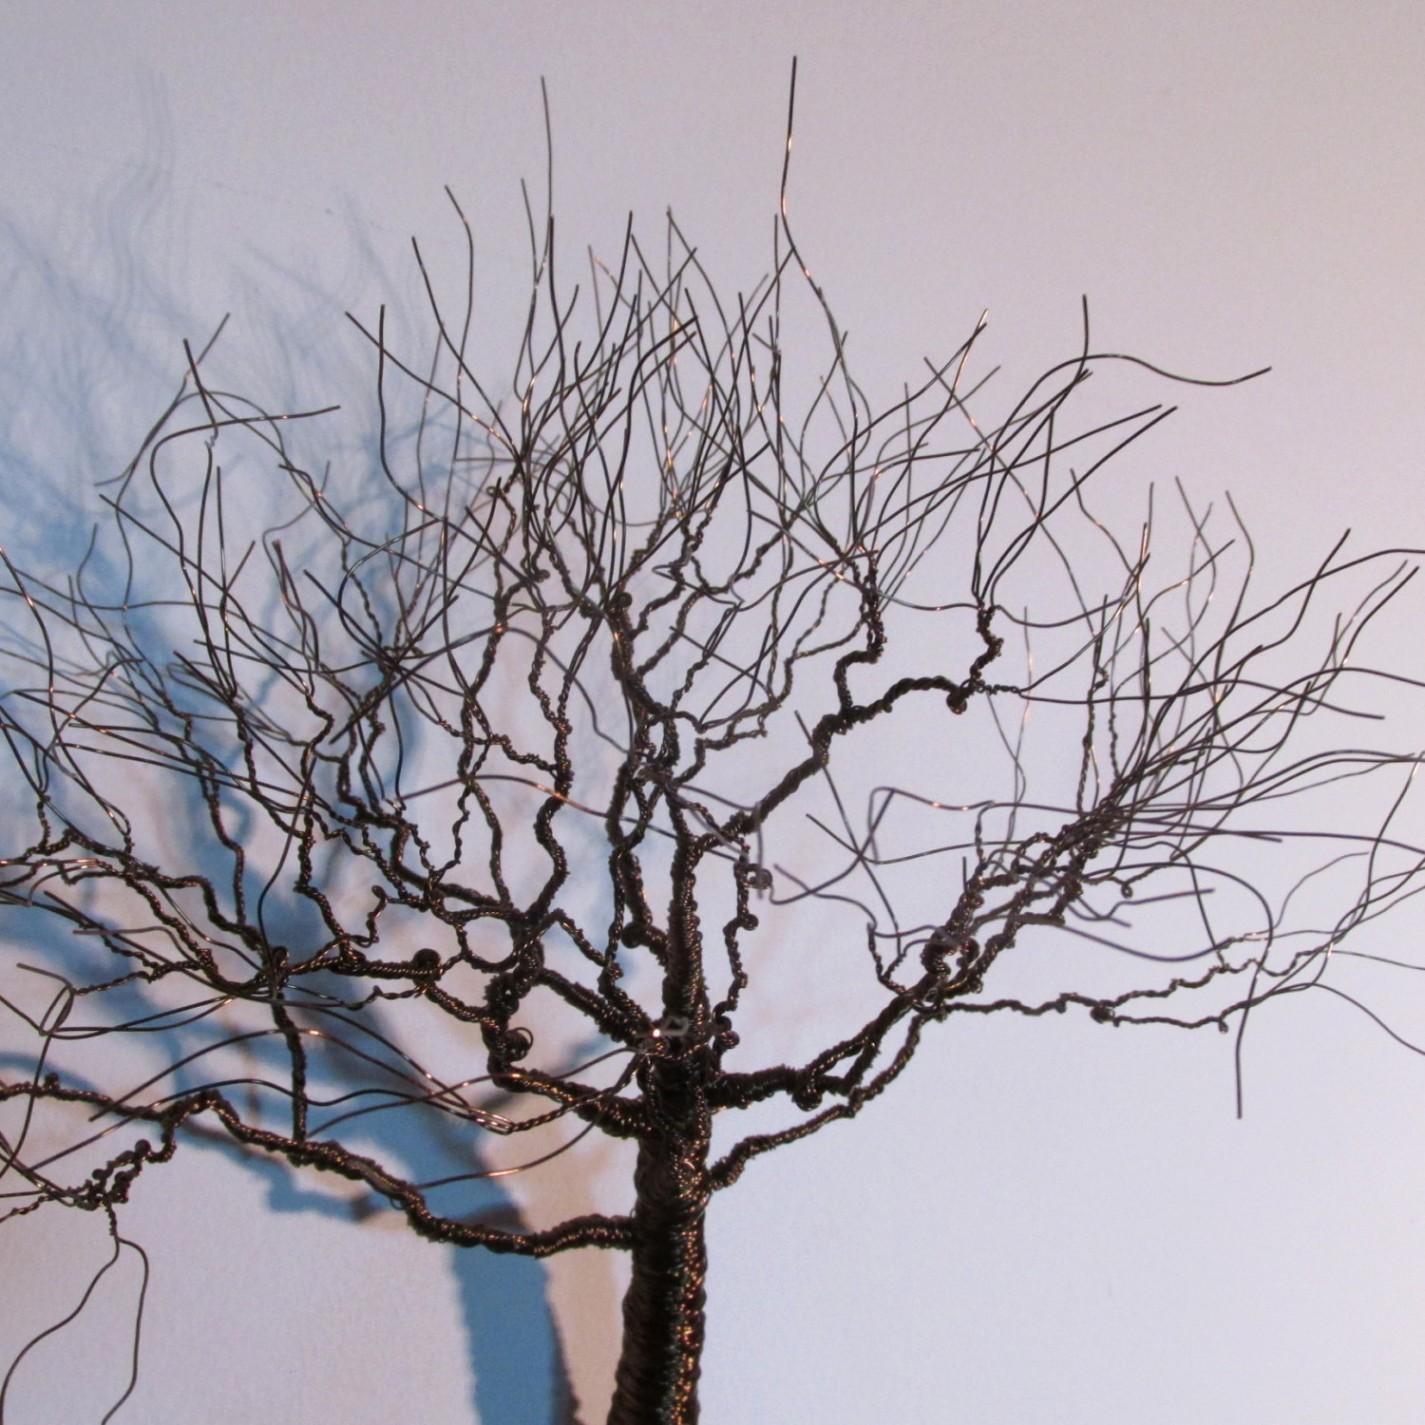 Inspirational Metal Wall Decor Palm Tree within Palm Tree Metal Art